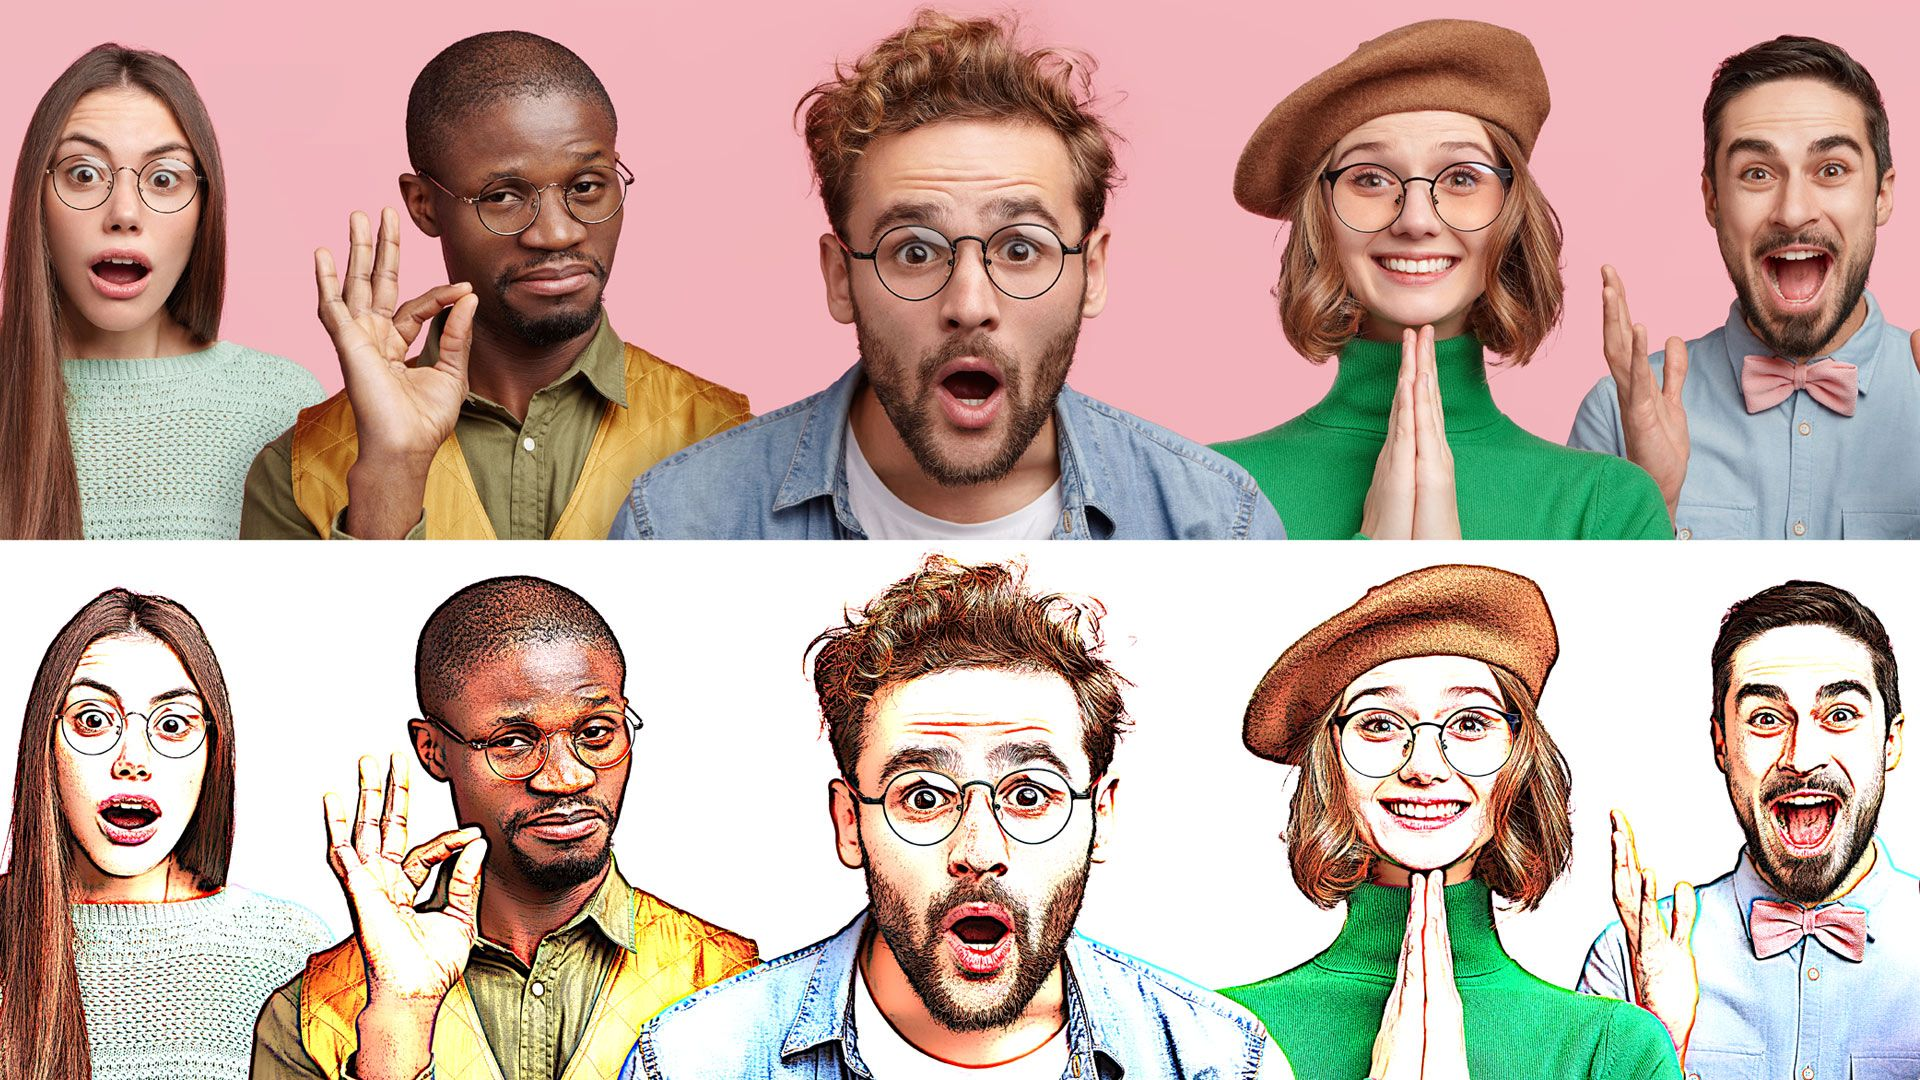 Turn Photo Into Comic Book Effect In Photoshop Tutorial Cartoon In Photoshop Photoshop Tutorial Make A Cartoon Photoshop